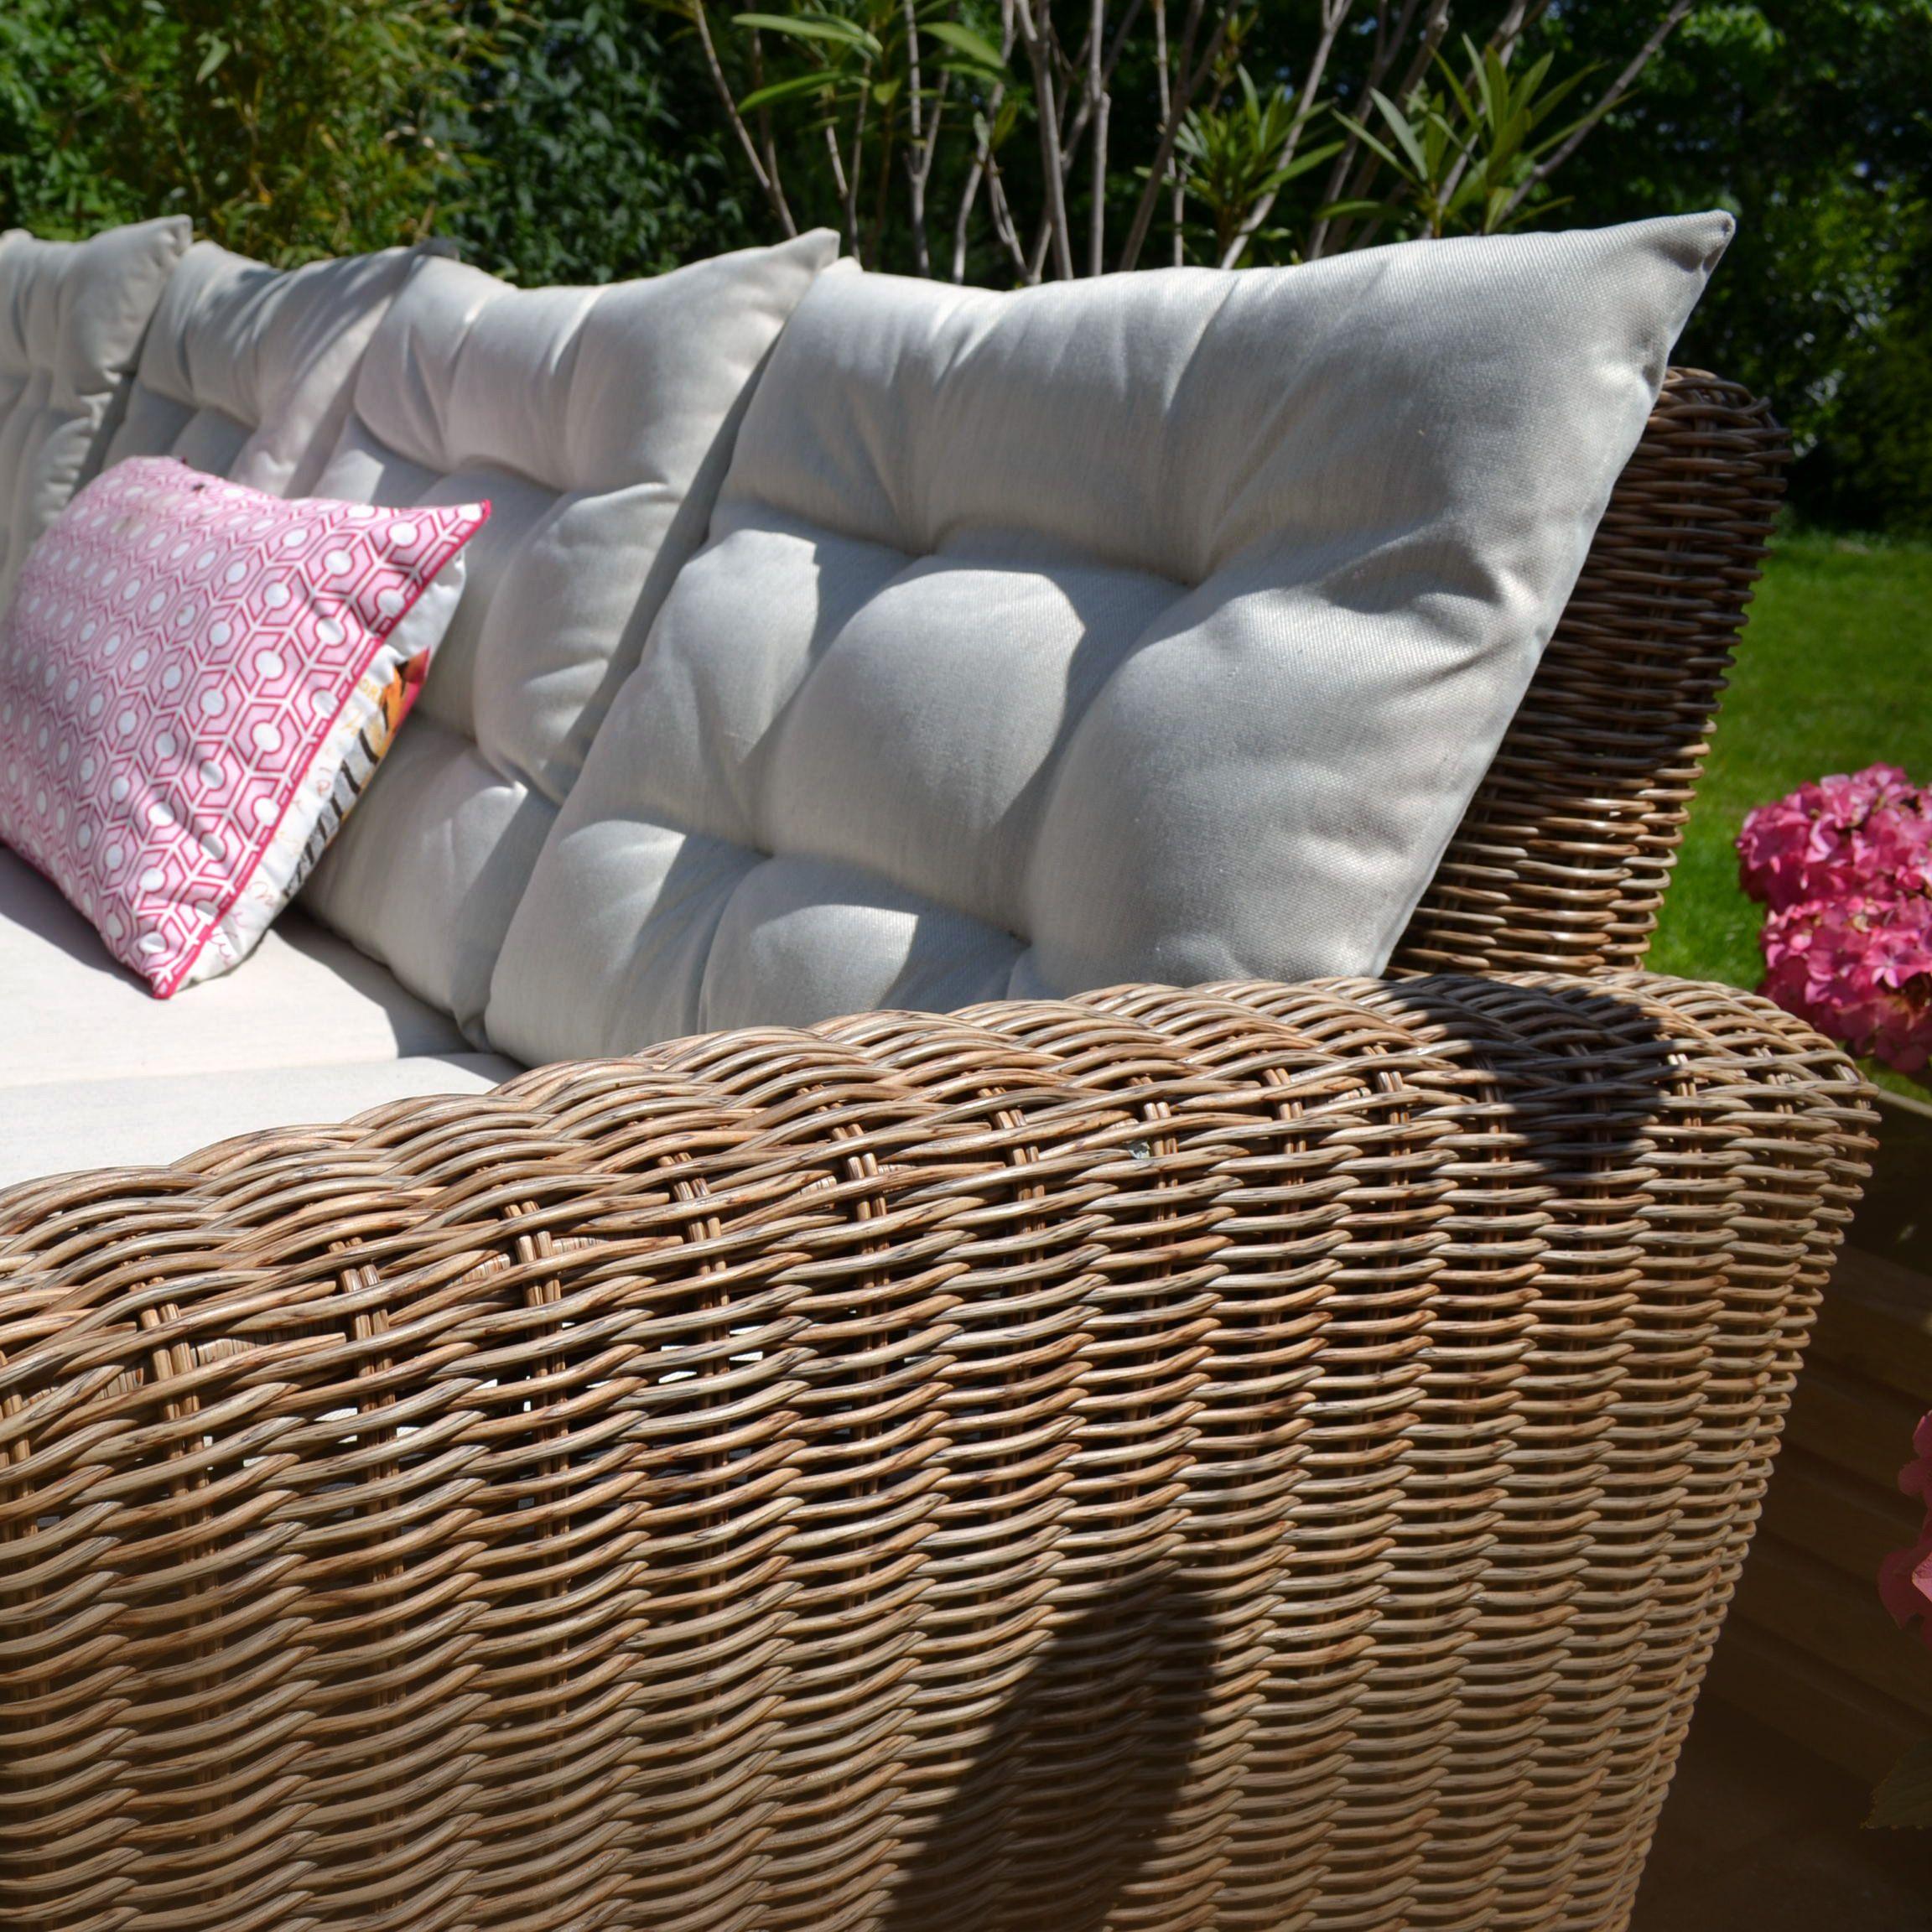 Manhattan Rattan Sitzlounge Lounge Polyrattan Gartenmobel